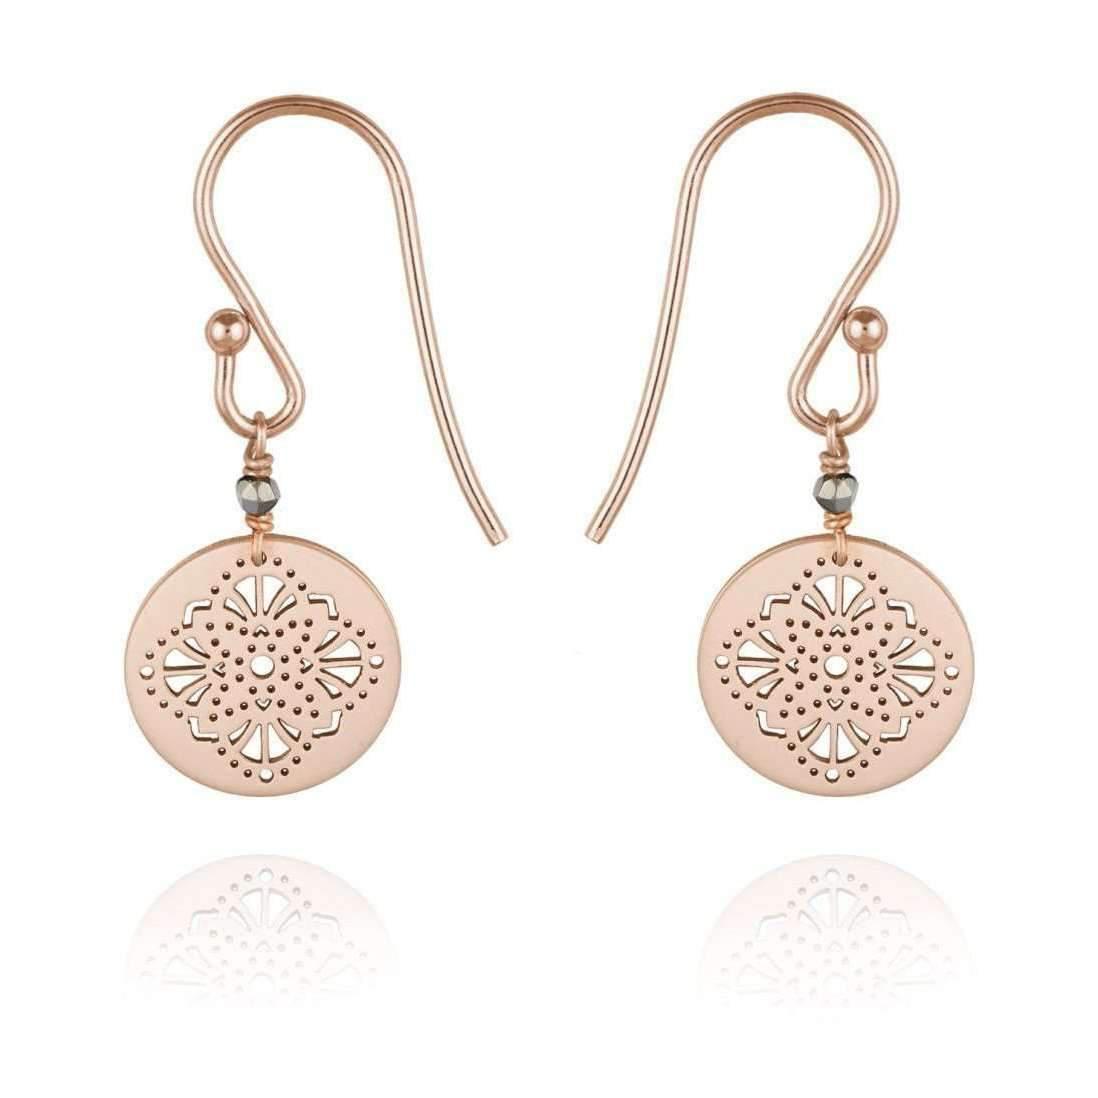 Perle de lune Art Deco Medal 9kt Rose Gold nrVsS7F